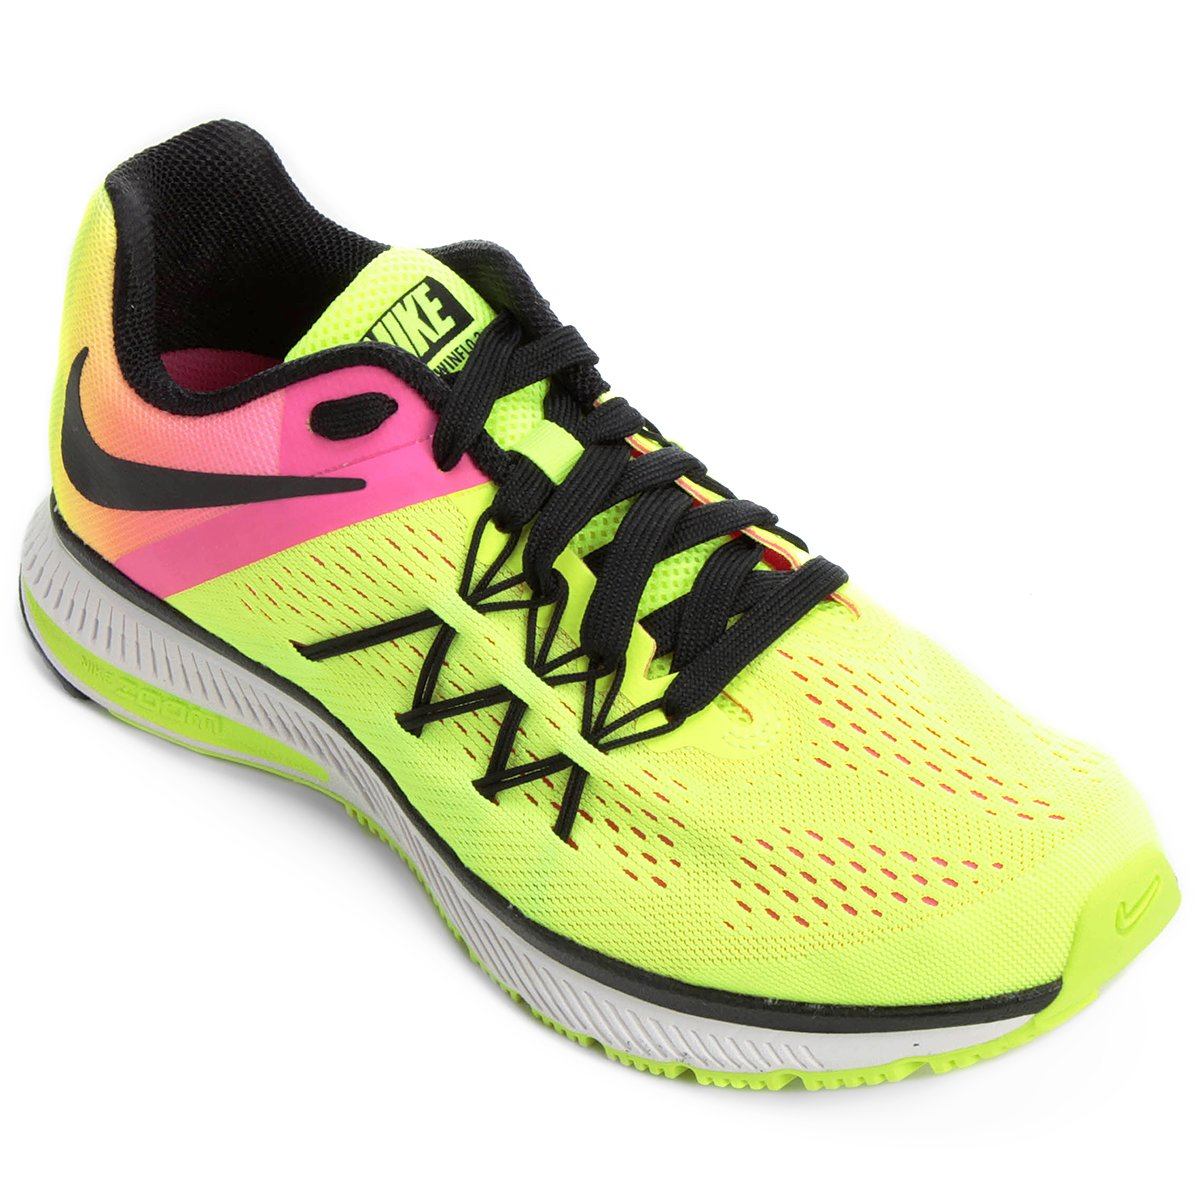 d4ad3b440d8 Tênis Nike Zoom Winflo 3 Masculino - Compre Agora